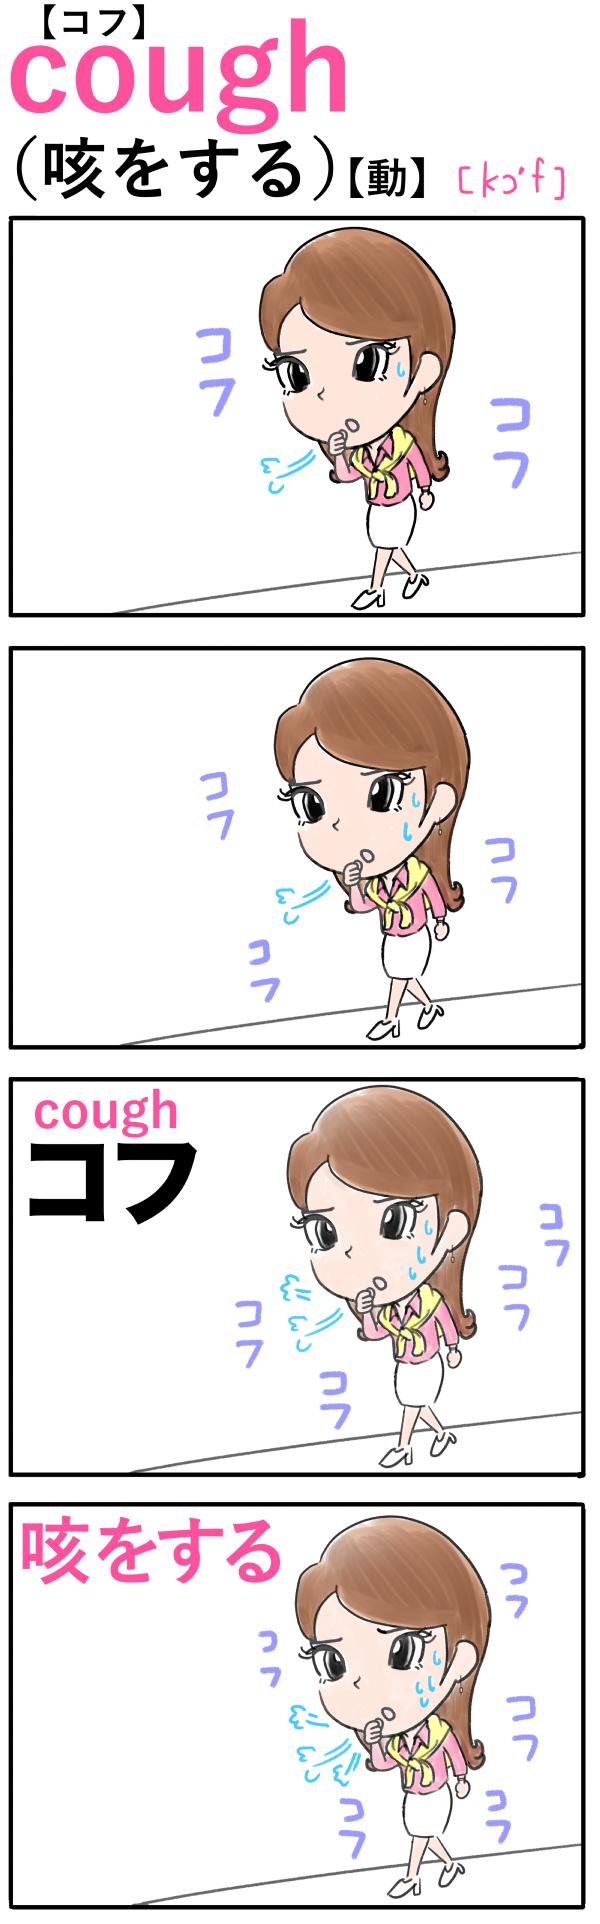 cough(咳をする)の語呂合わせ英単語